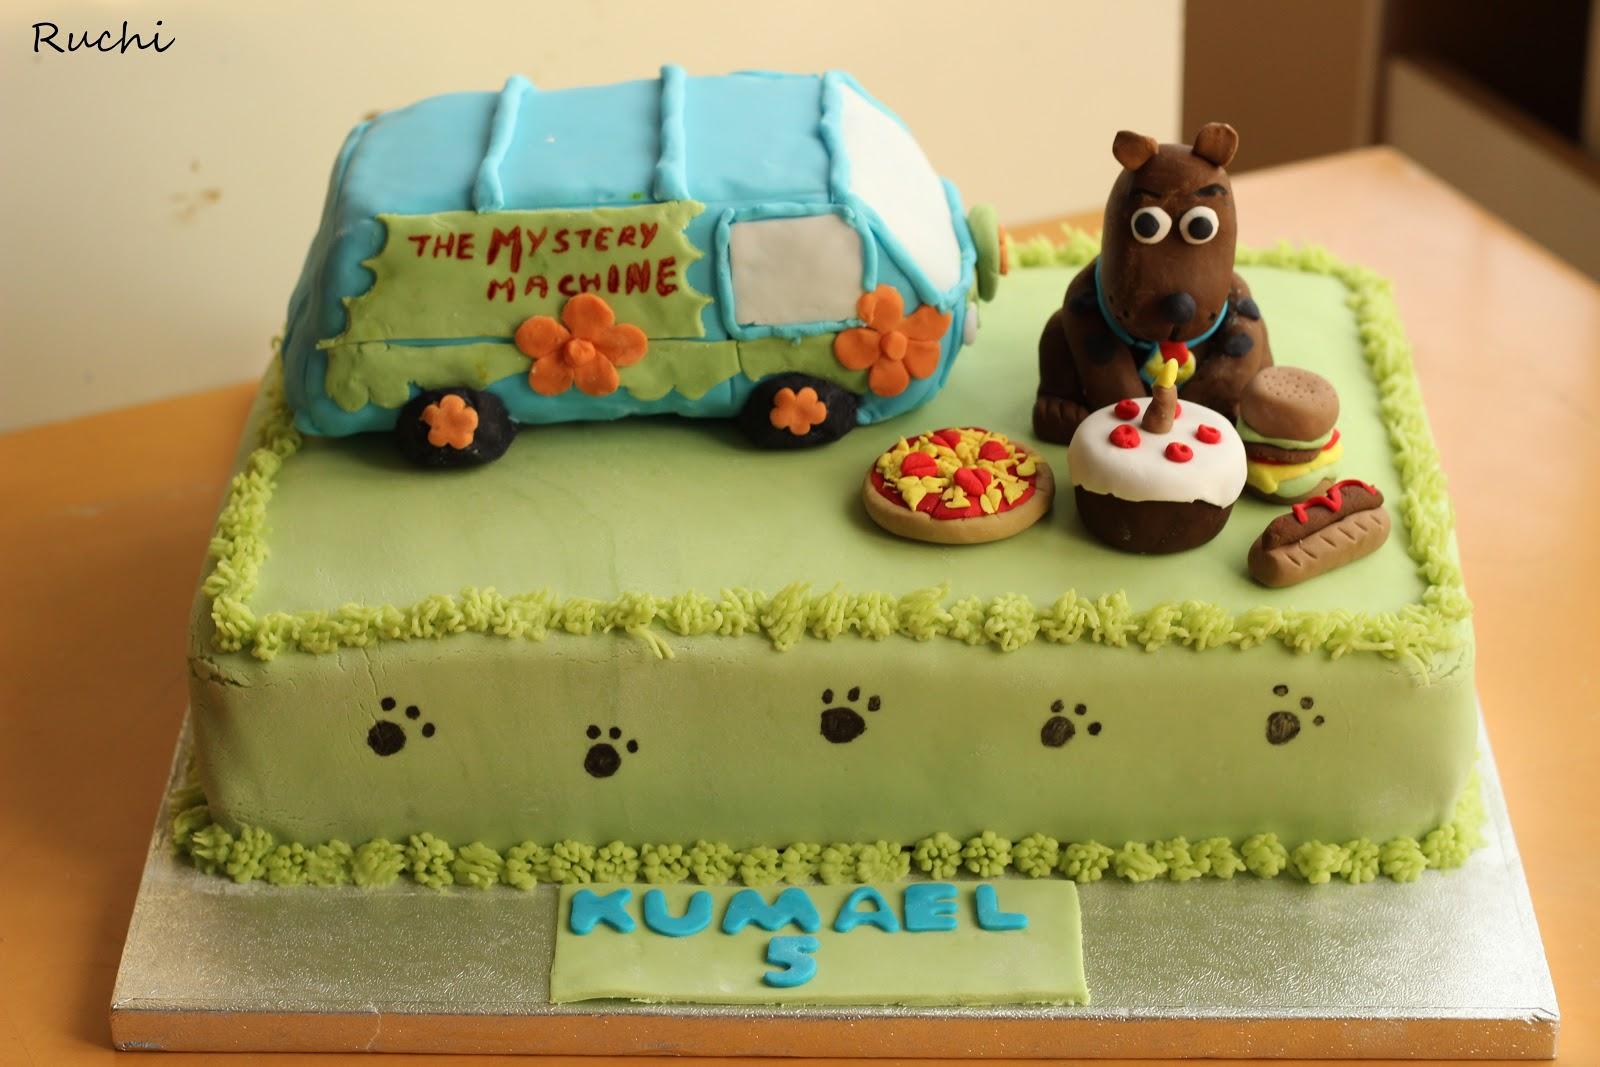 Cake Images Ruchi : RUCHI: Scobee Doo Cake